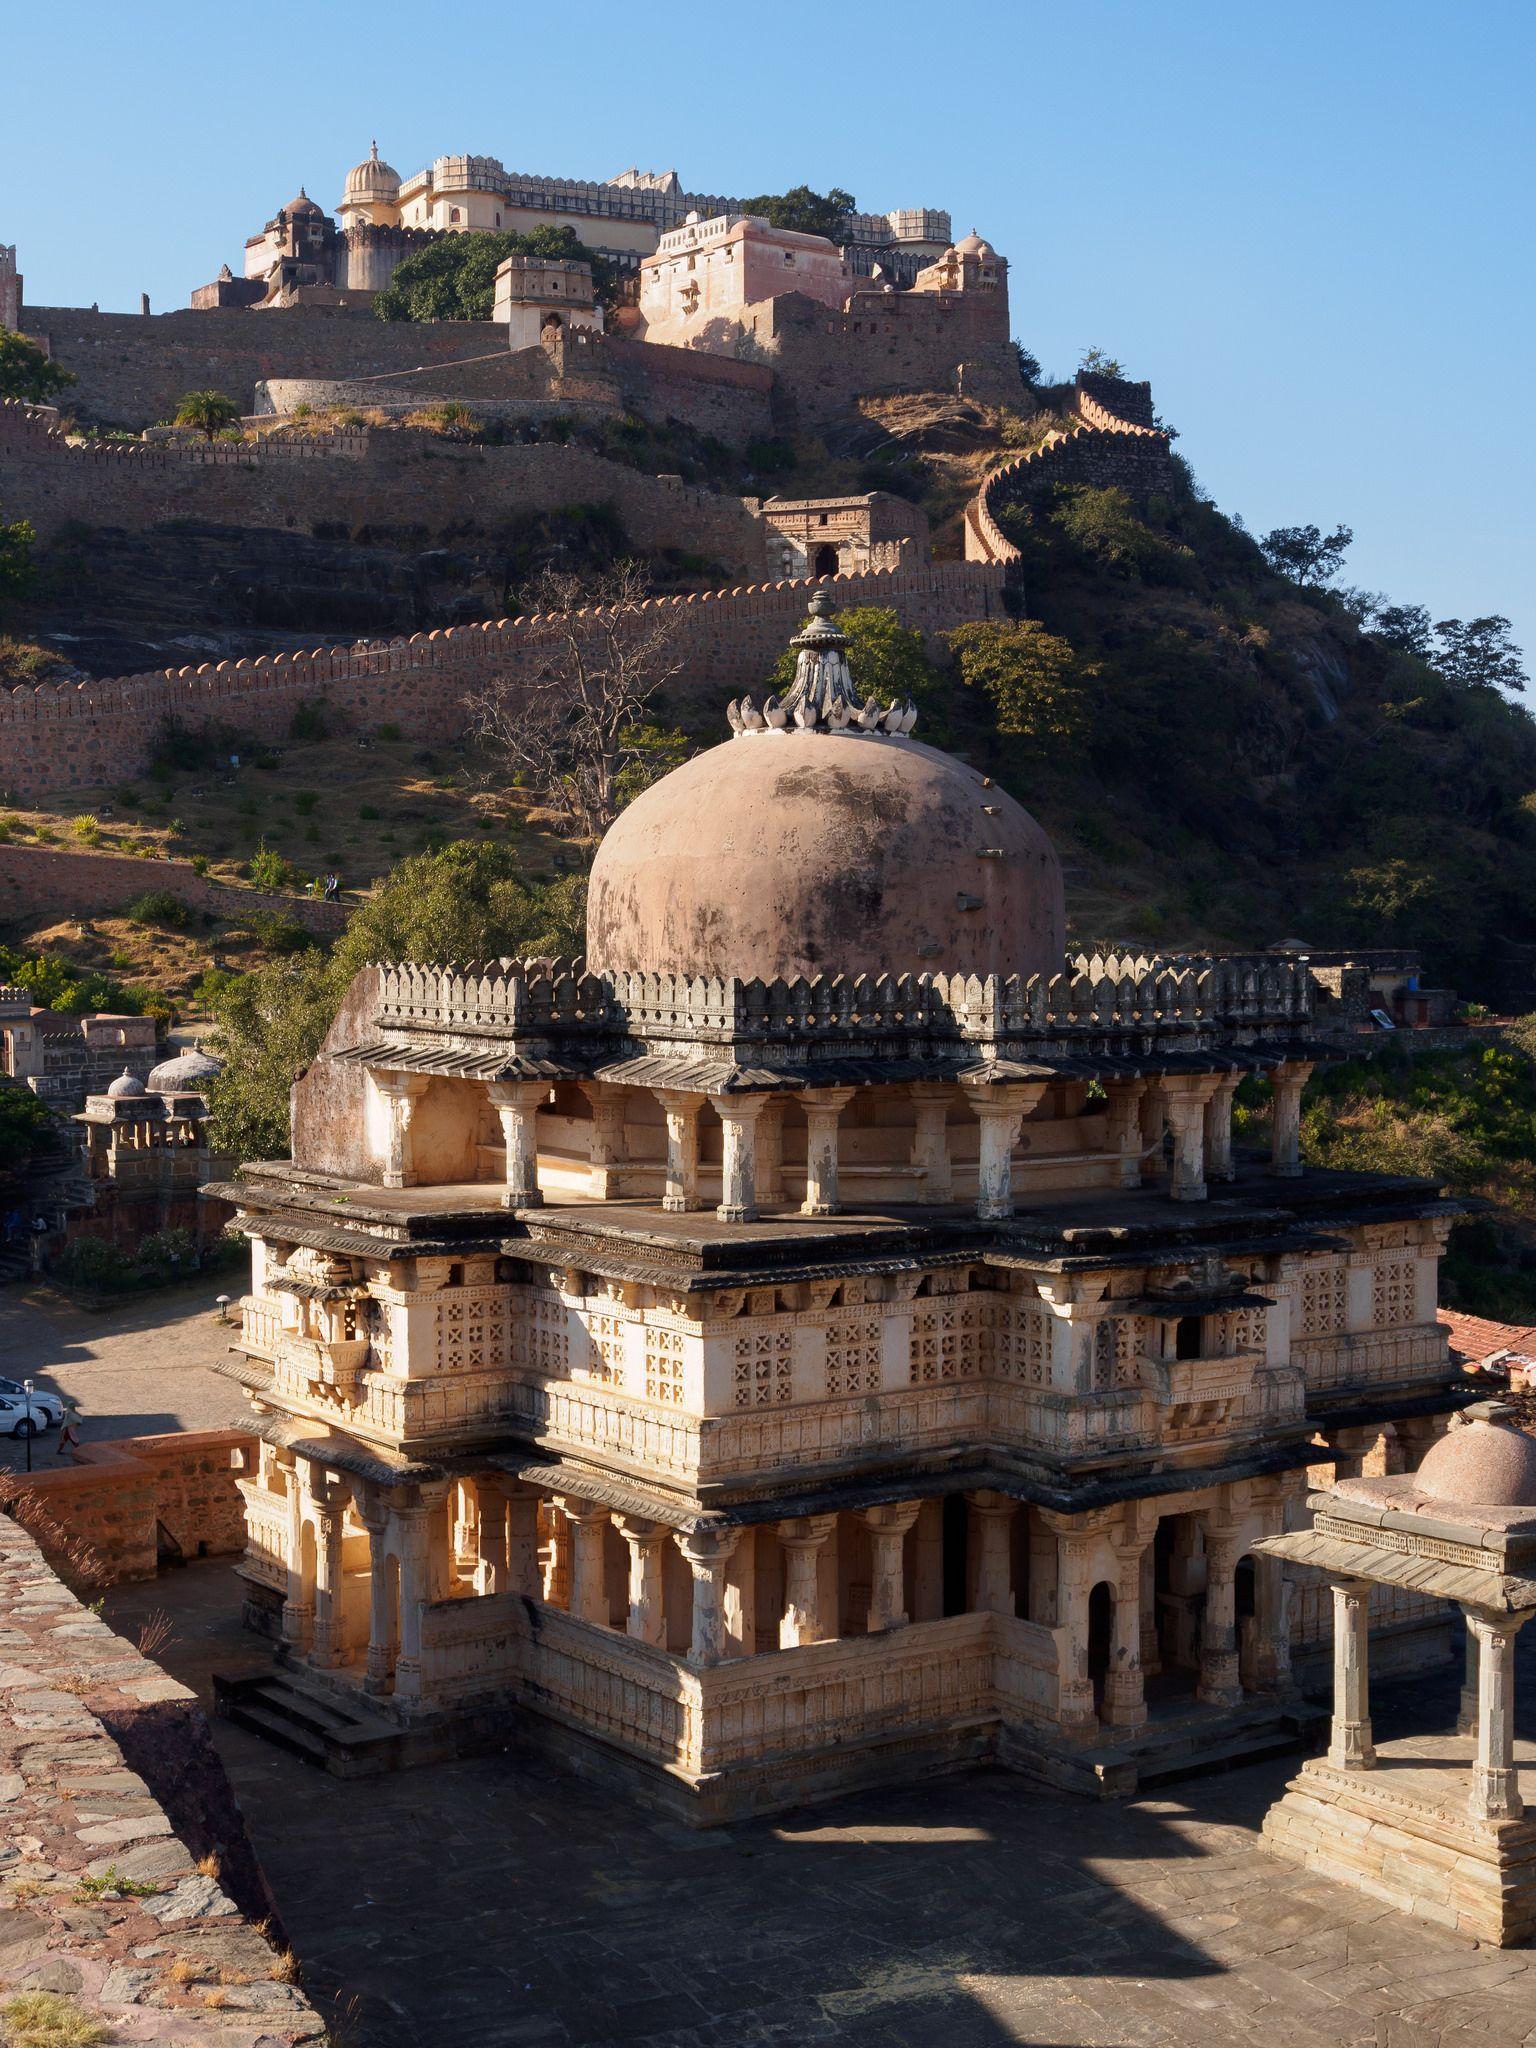 Kumbhalgarh Fort in 2020 Rajasthan india, India